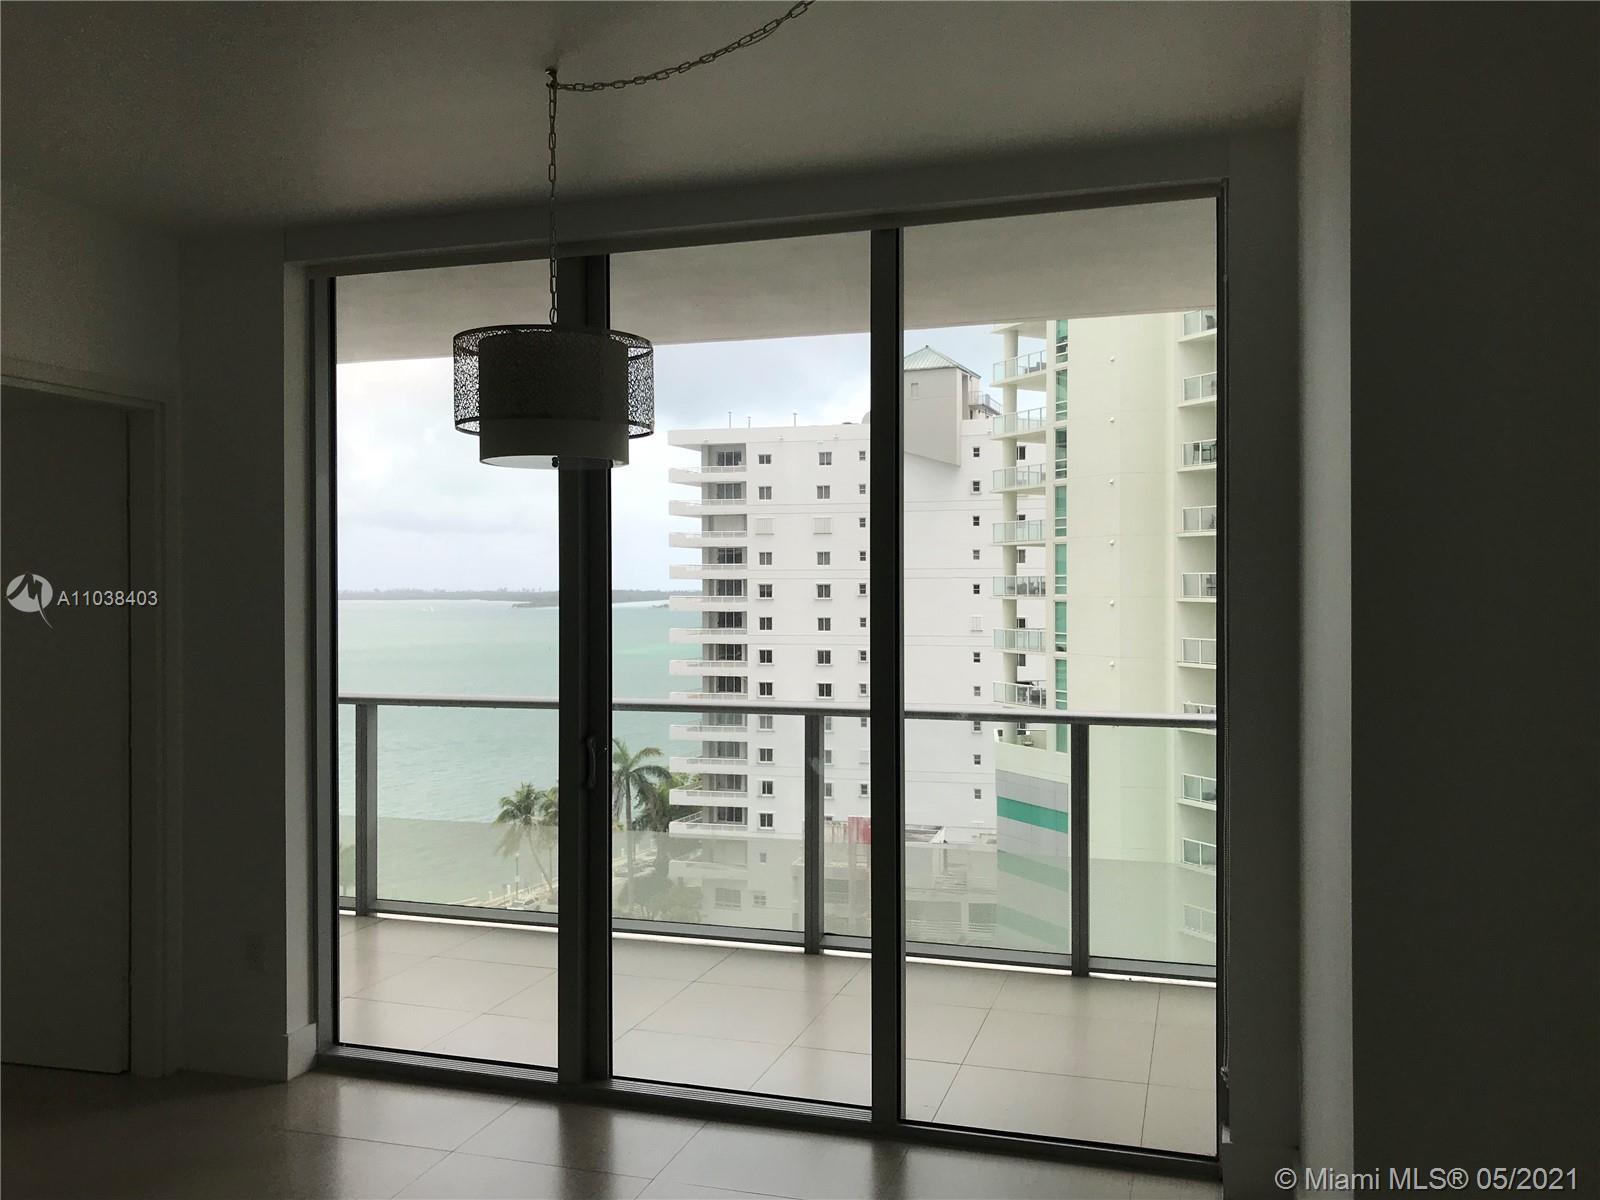 Brickell House #1104 - 1300 BRICKELL BAY DR #1104, Miami, FL 33131